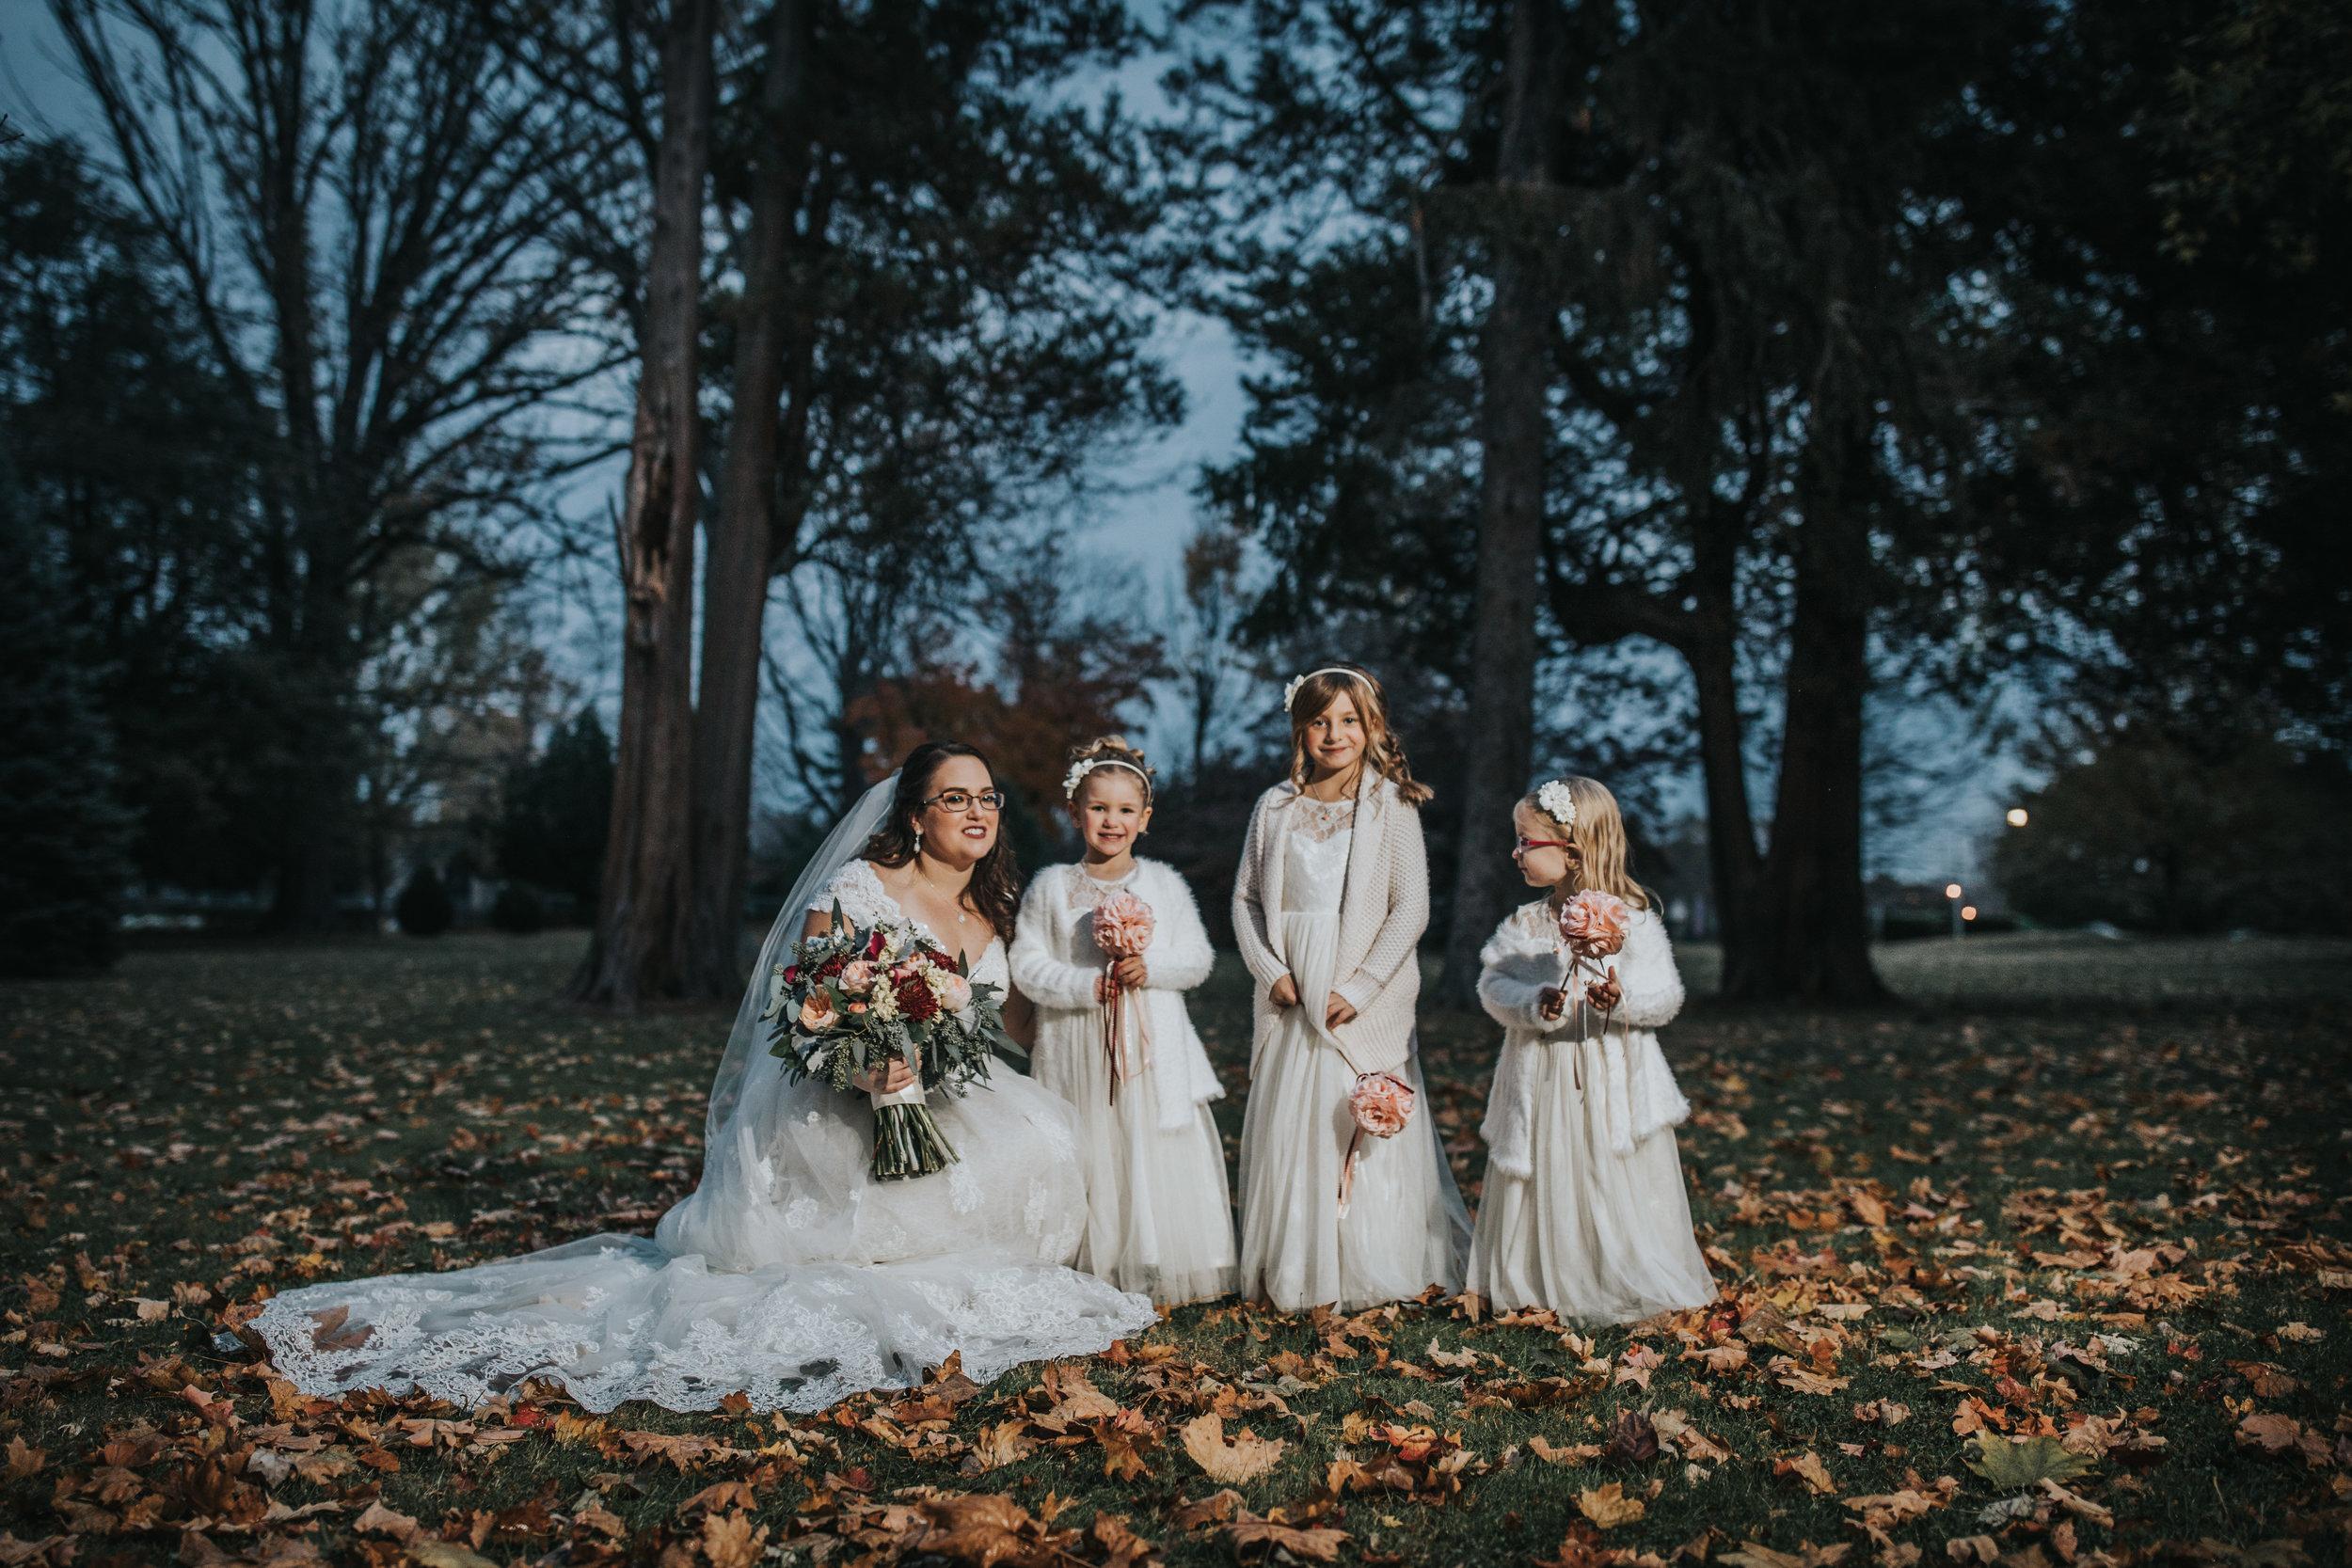 New-Jersey-Wedding-Photography-Fishers-Tudor-House-JennaLynnPhotography-BridalParty-Kathleen&Eddie-20.jpg